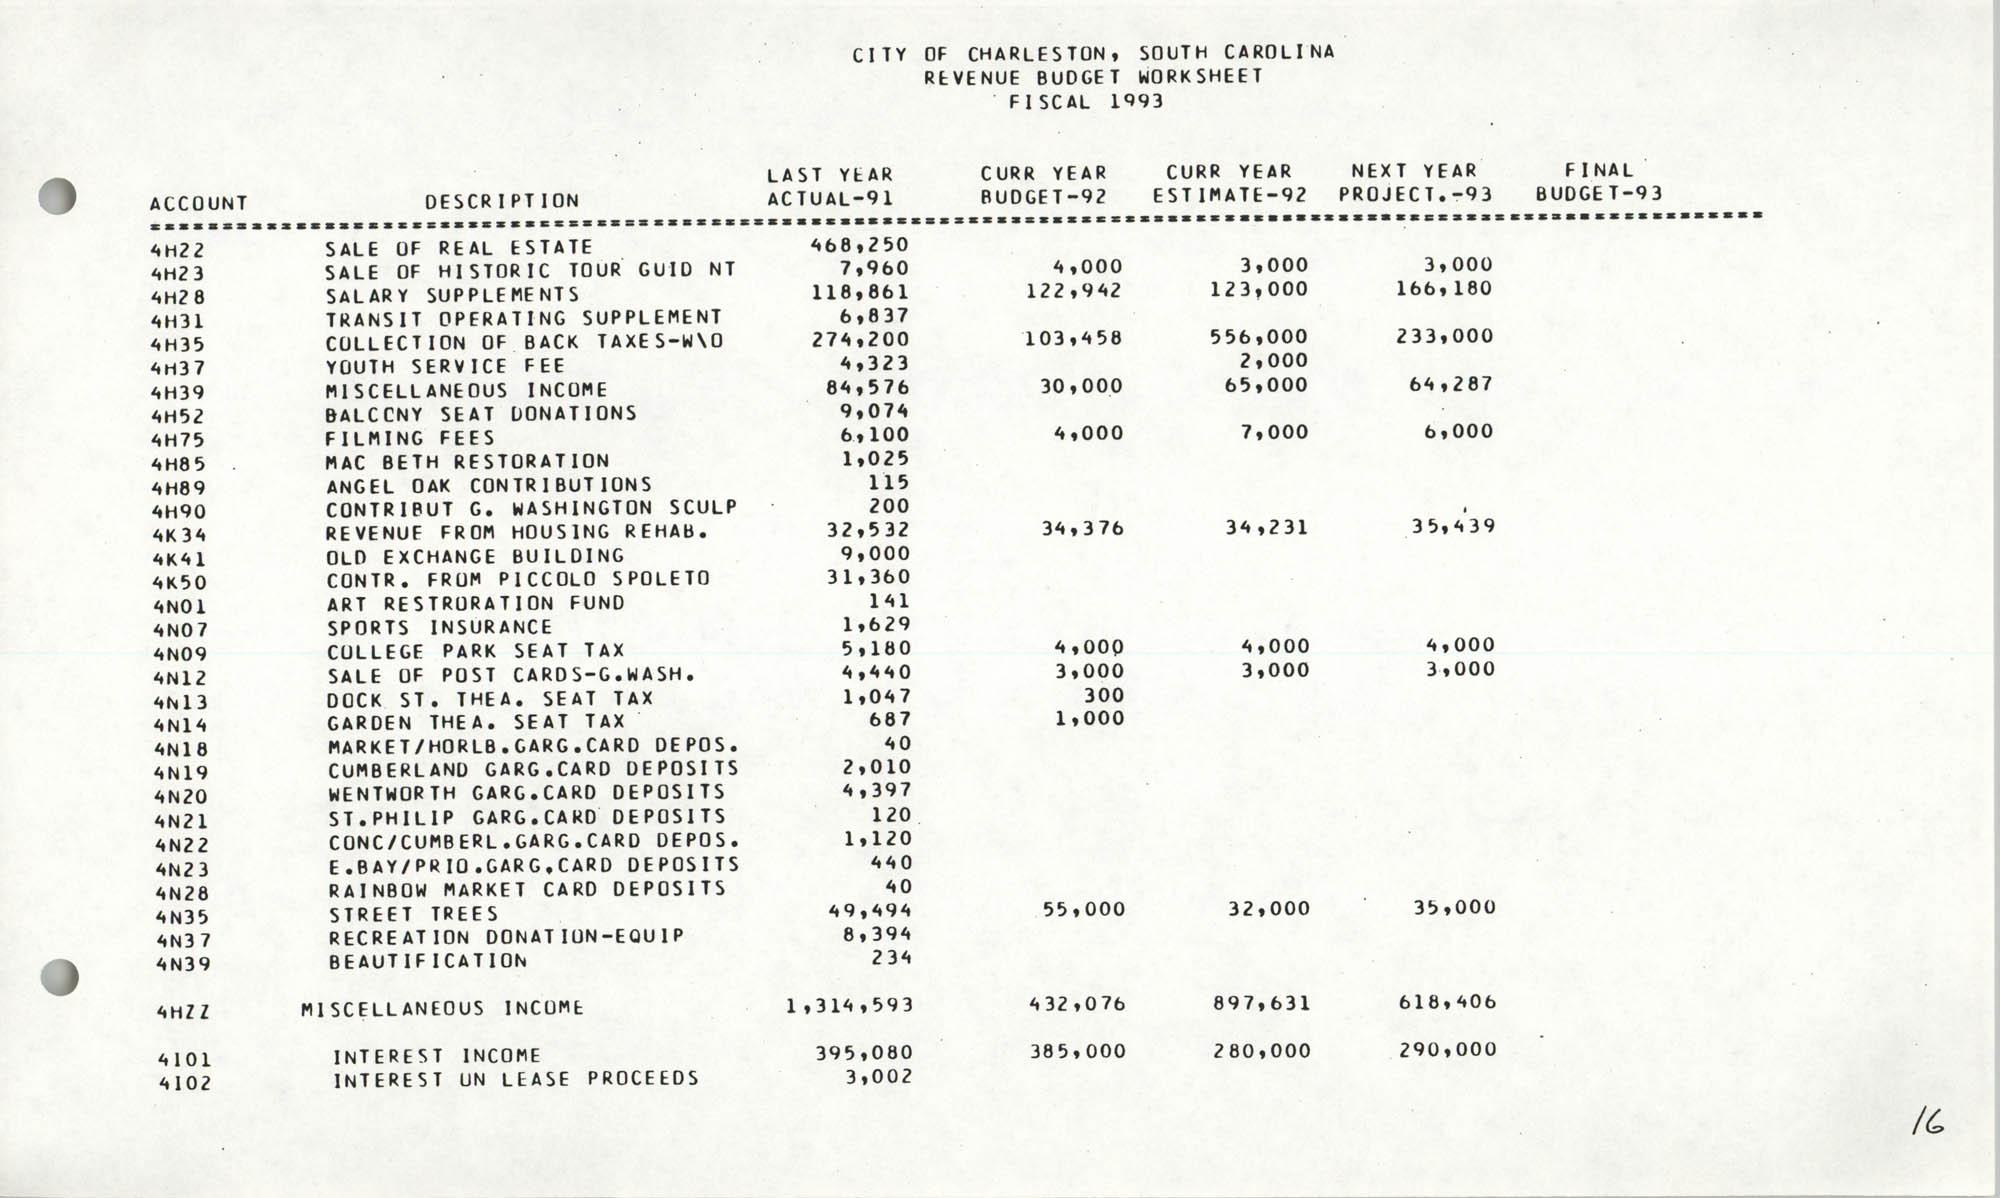 The City Council of Charleston, South Carolina, 1993 Budget, Page 16